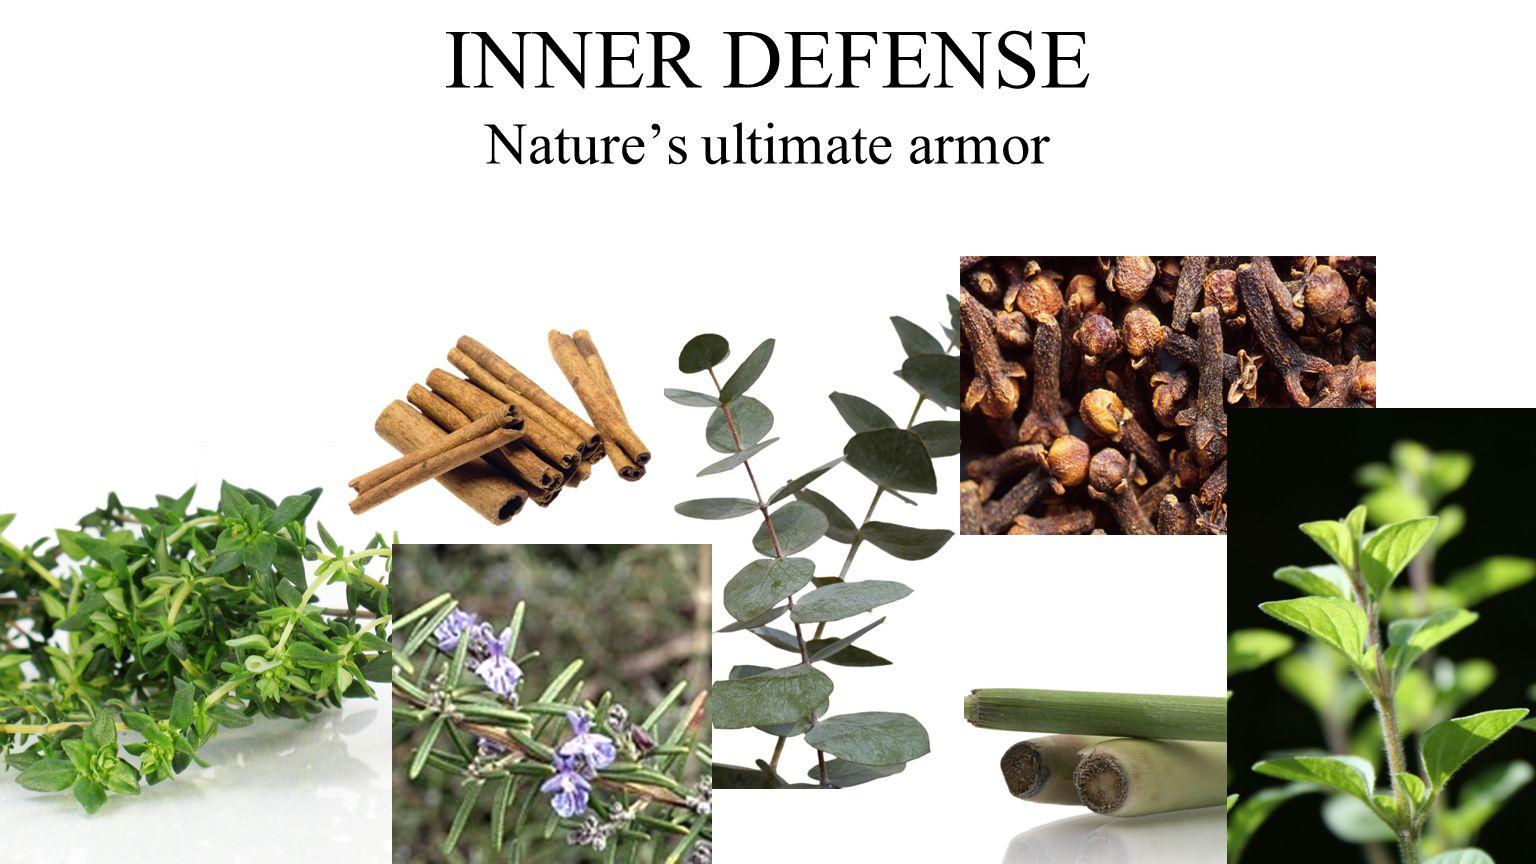 INNER DEFENSE Nature's ultimate armor